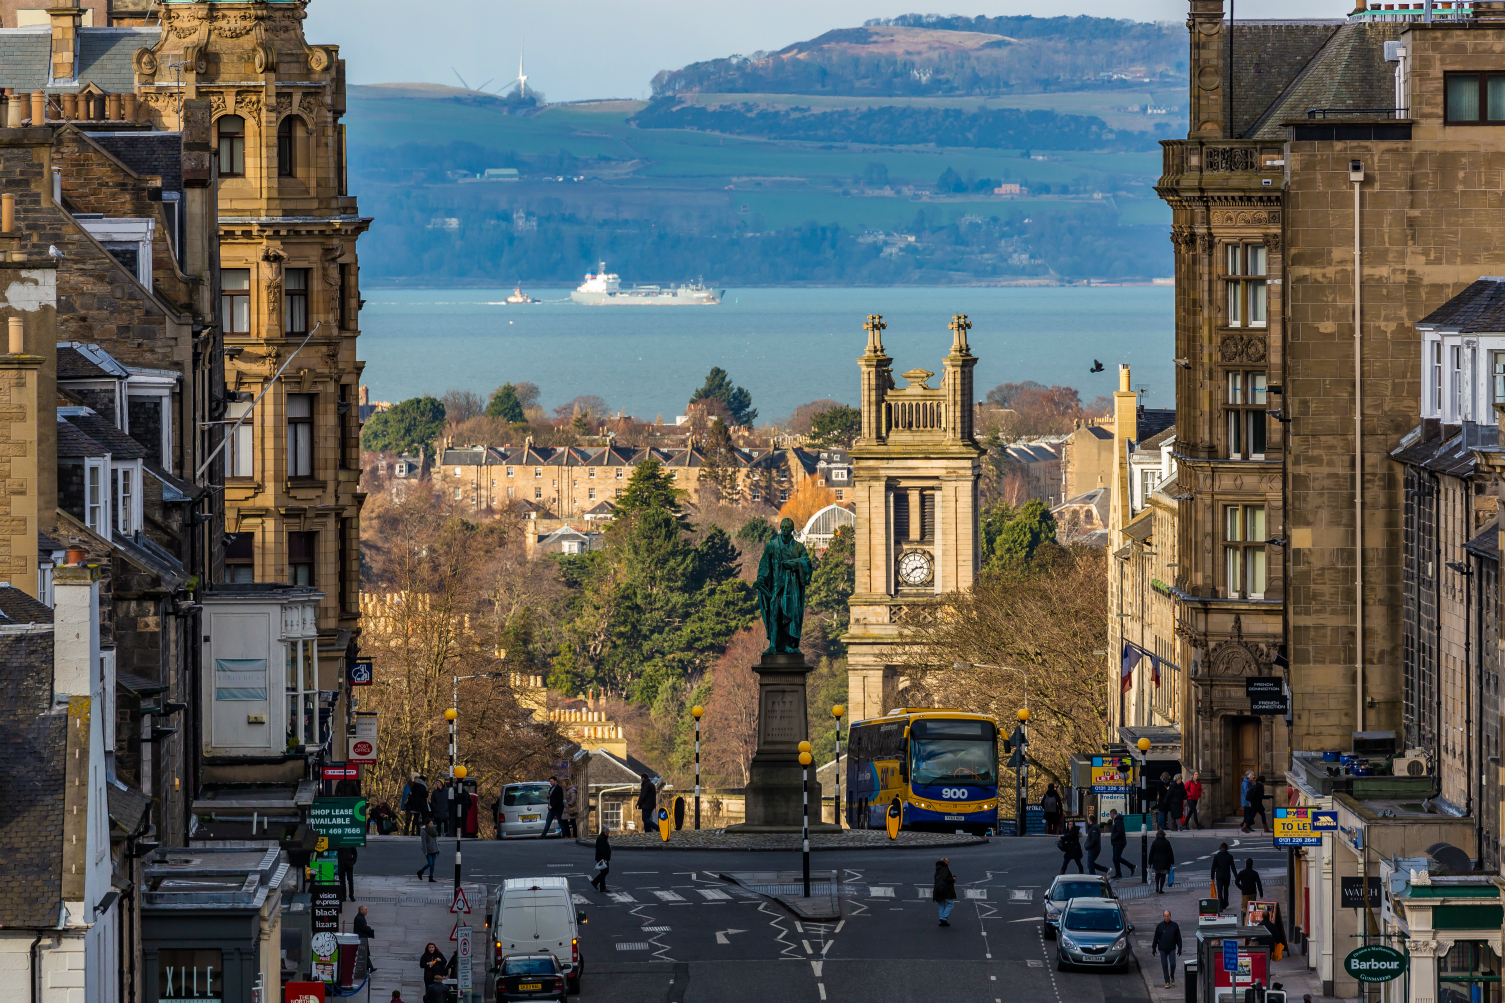 (31) Frederick Street, the Pitt Statue in George Street, St Stephen's Church Stockbridge, New Town, Firth of Forth and Kingdom of Fife, Edinburgh, Scotland. Copyright David Wheater.jpg